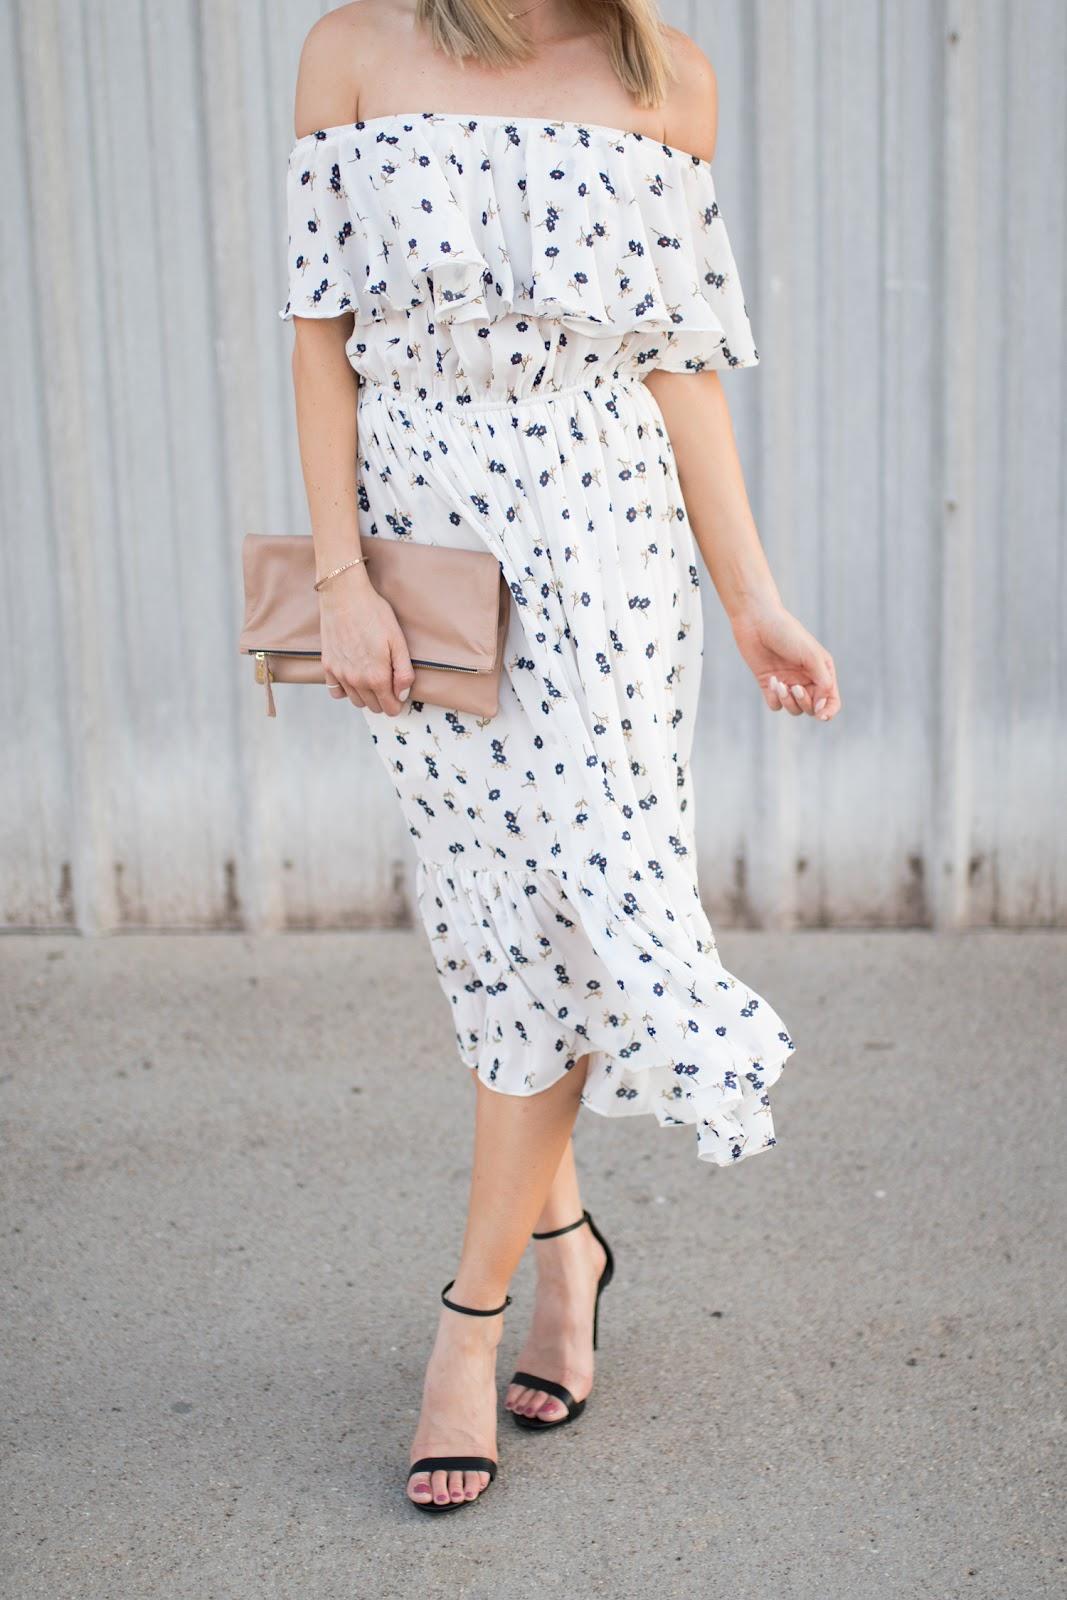 Off-the-shoulder midi dress